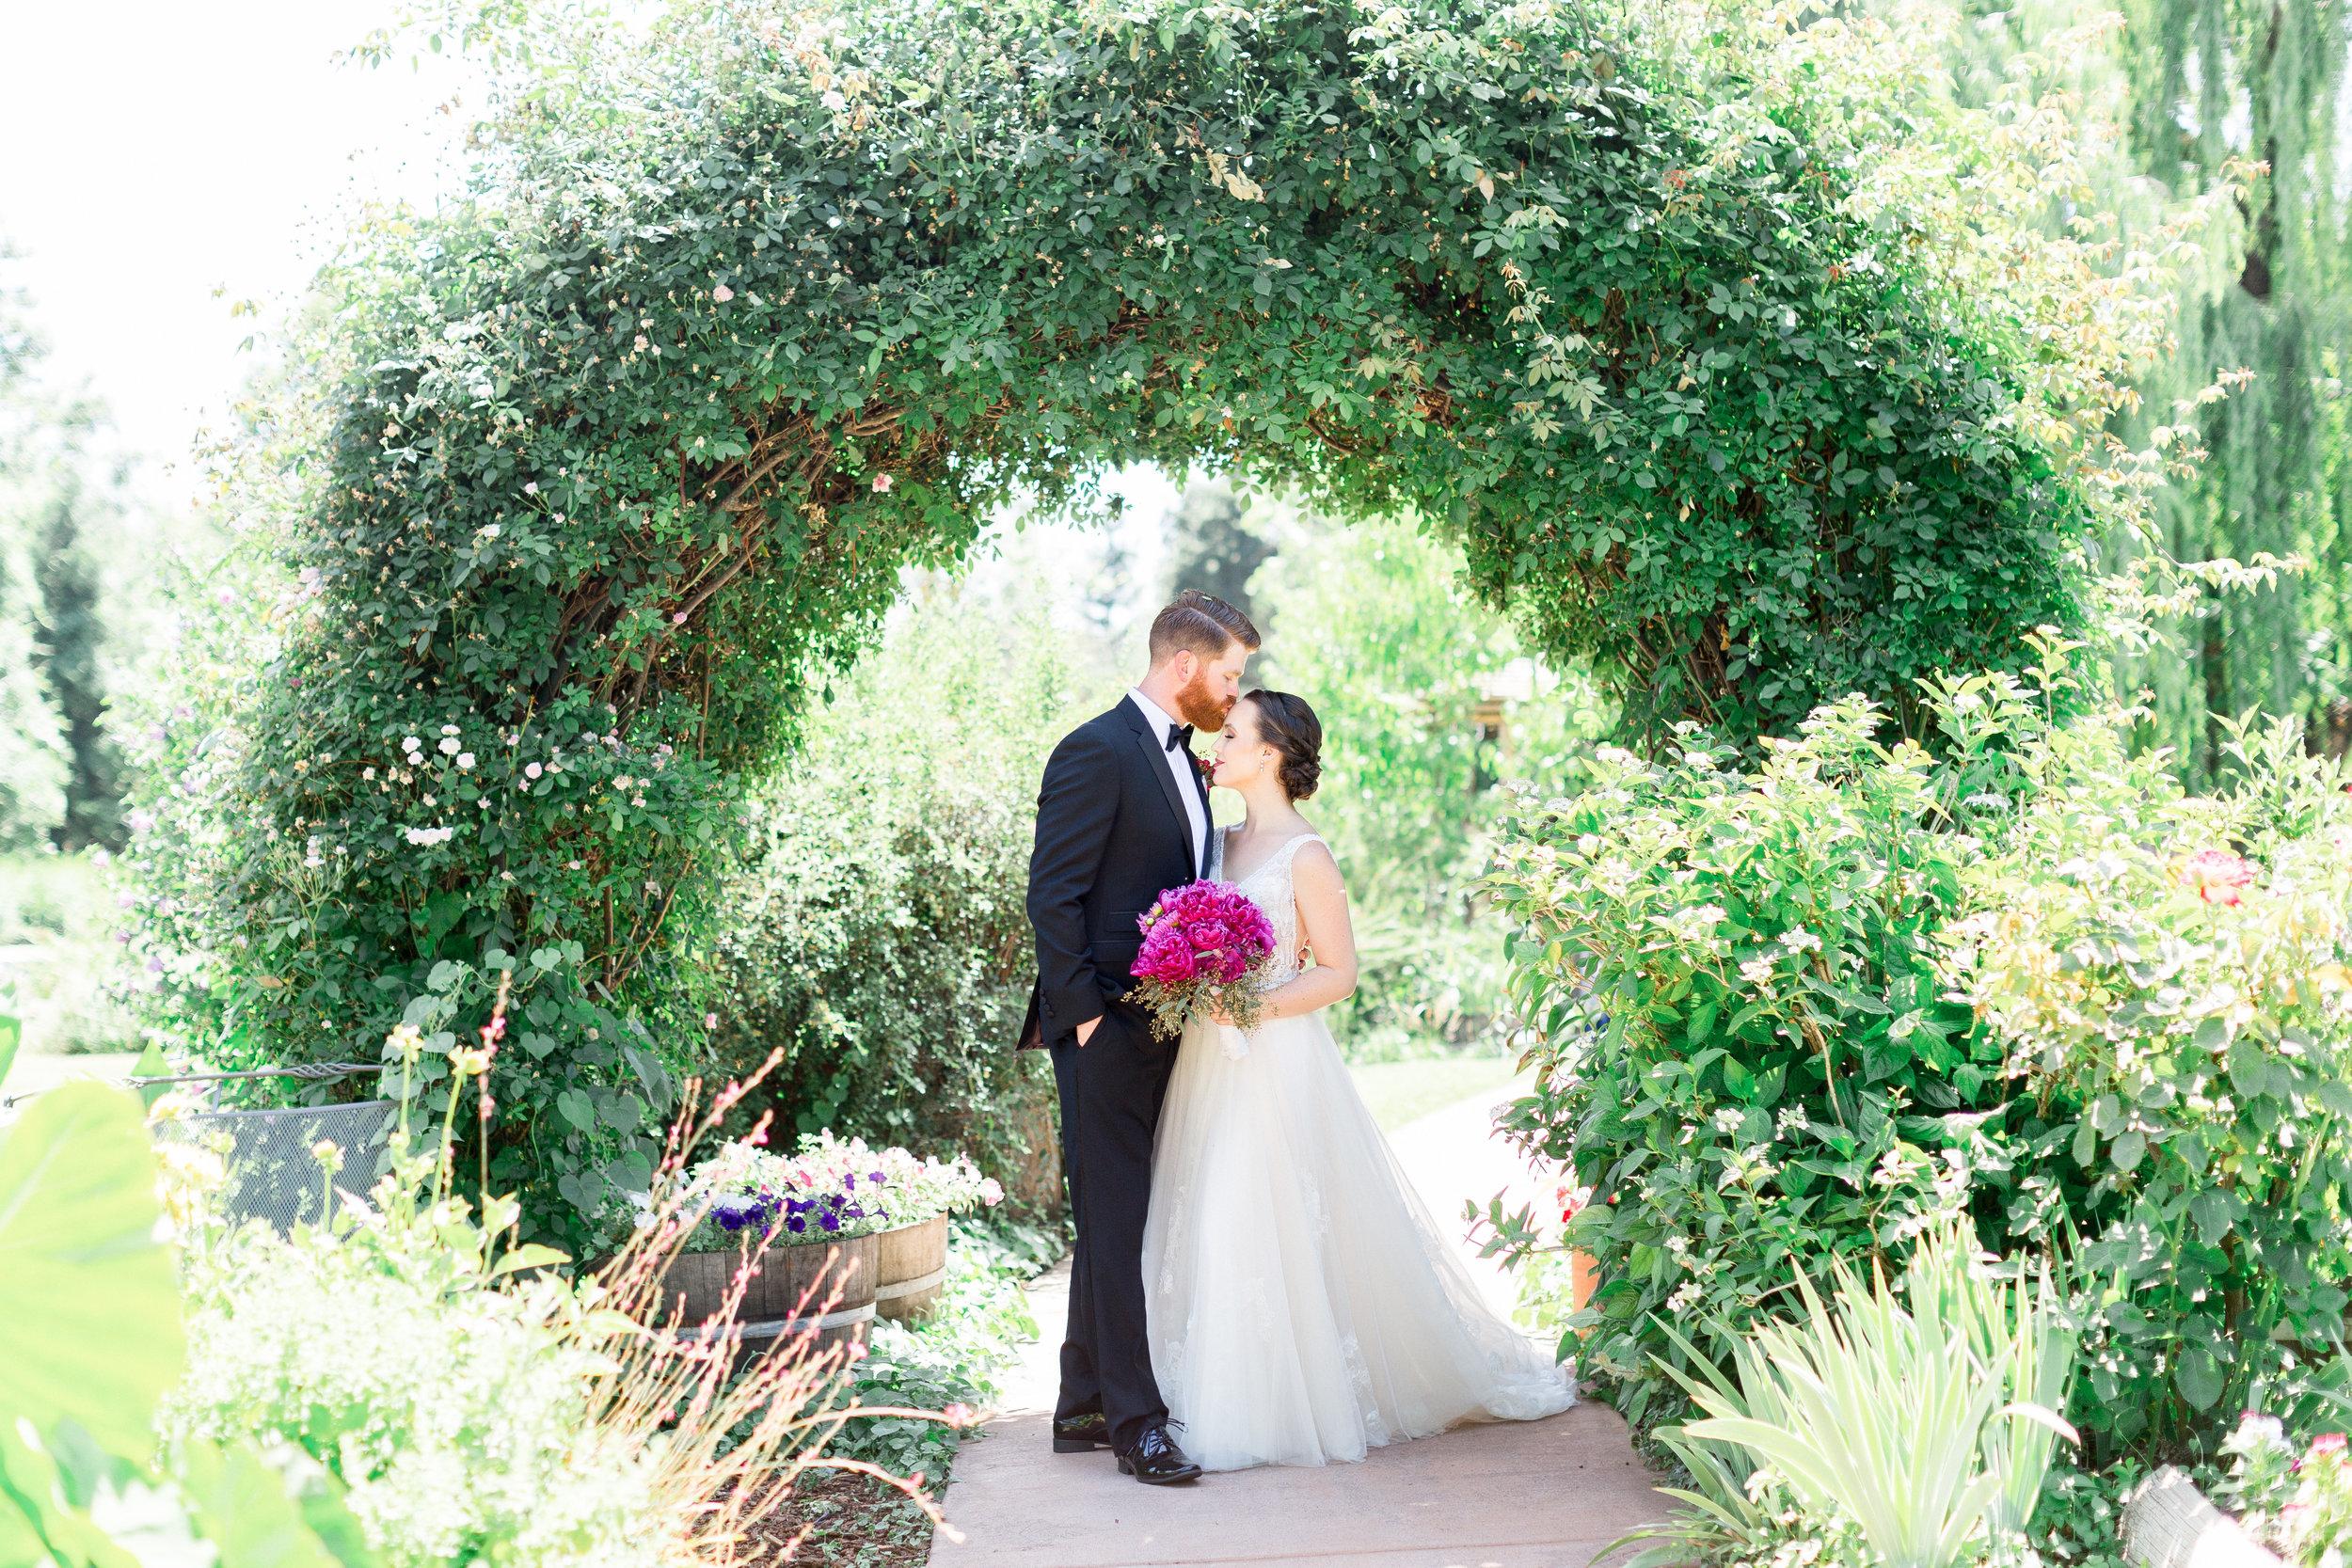 wedding-photographers-located-in-chico-ca.jpg